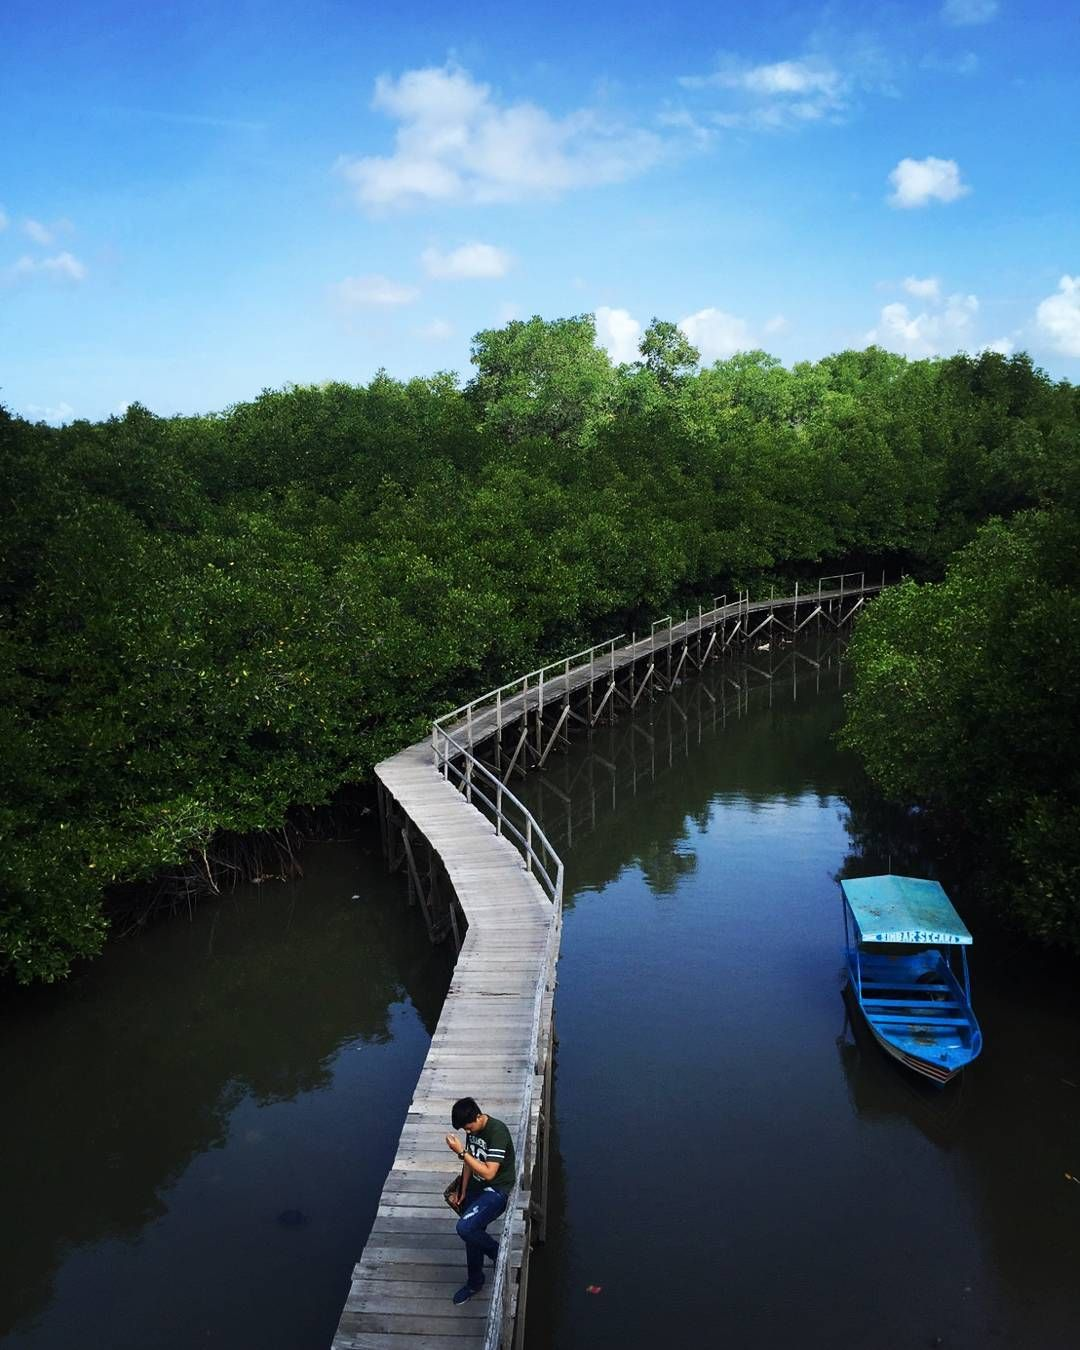 Ekowisata Mangrove Wanasari Atau Yang Dikenal Juga Sebagai